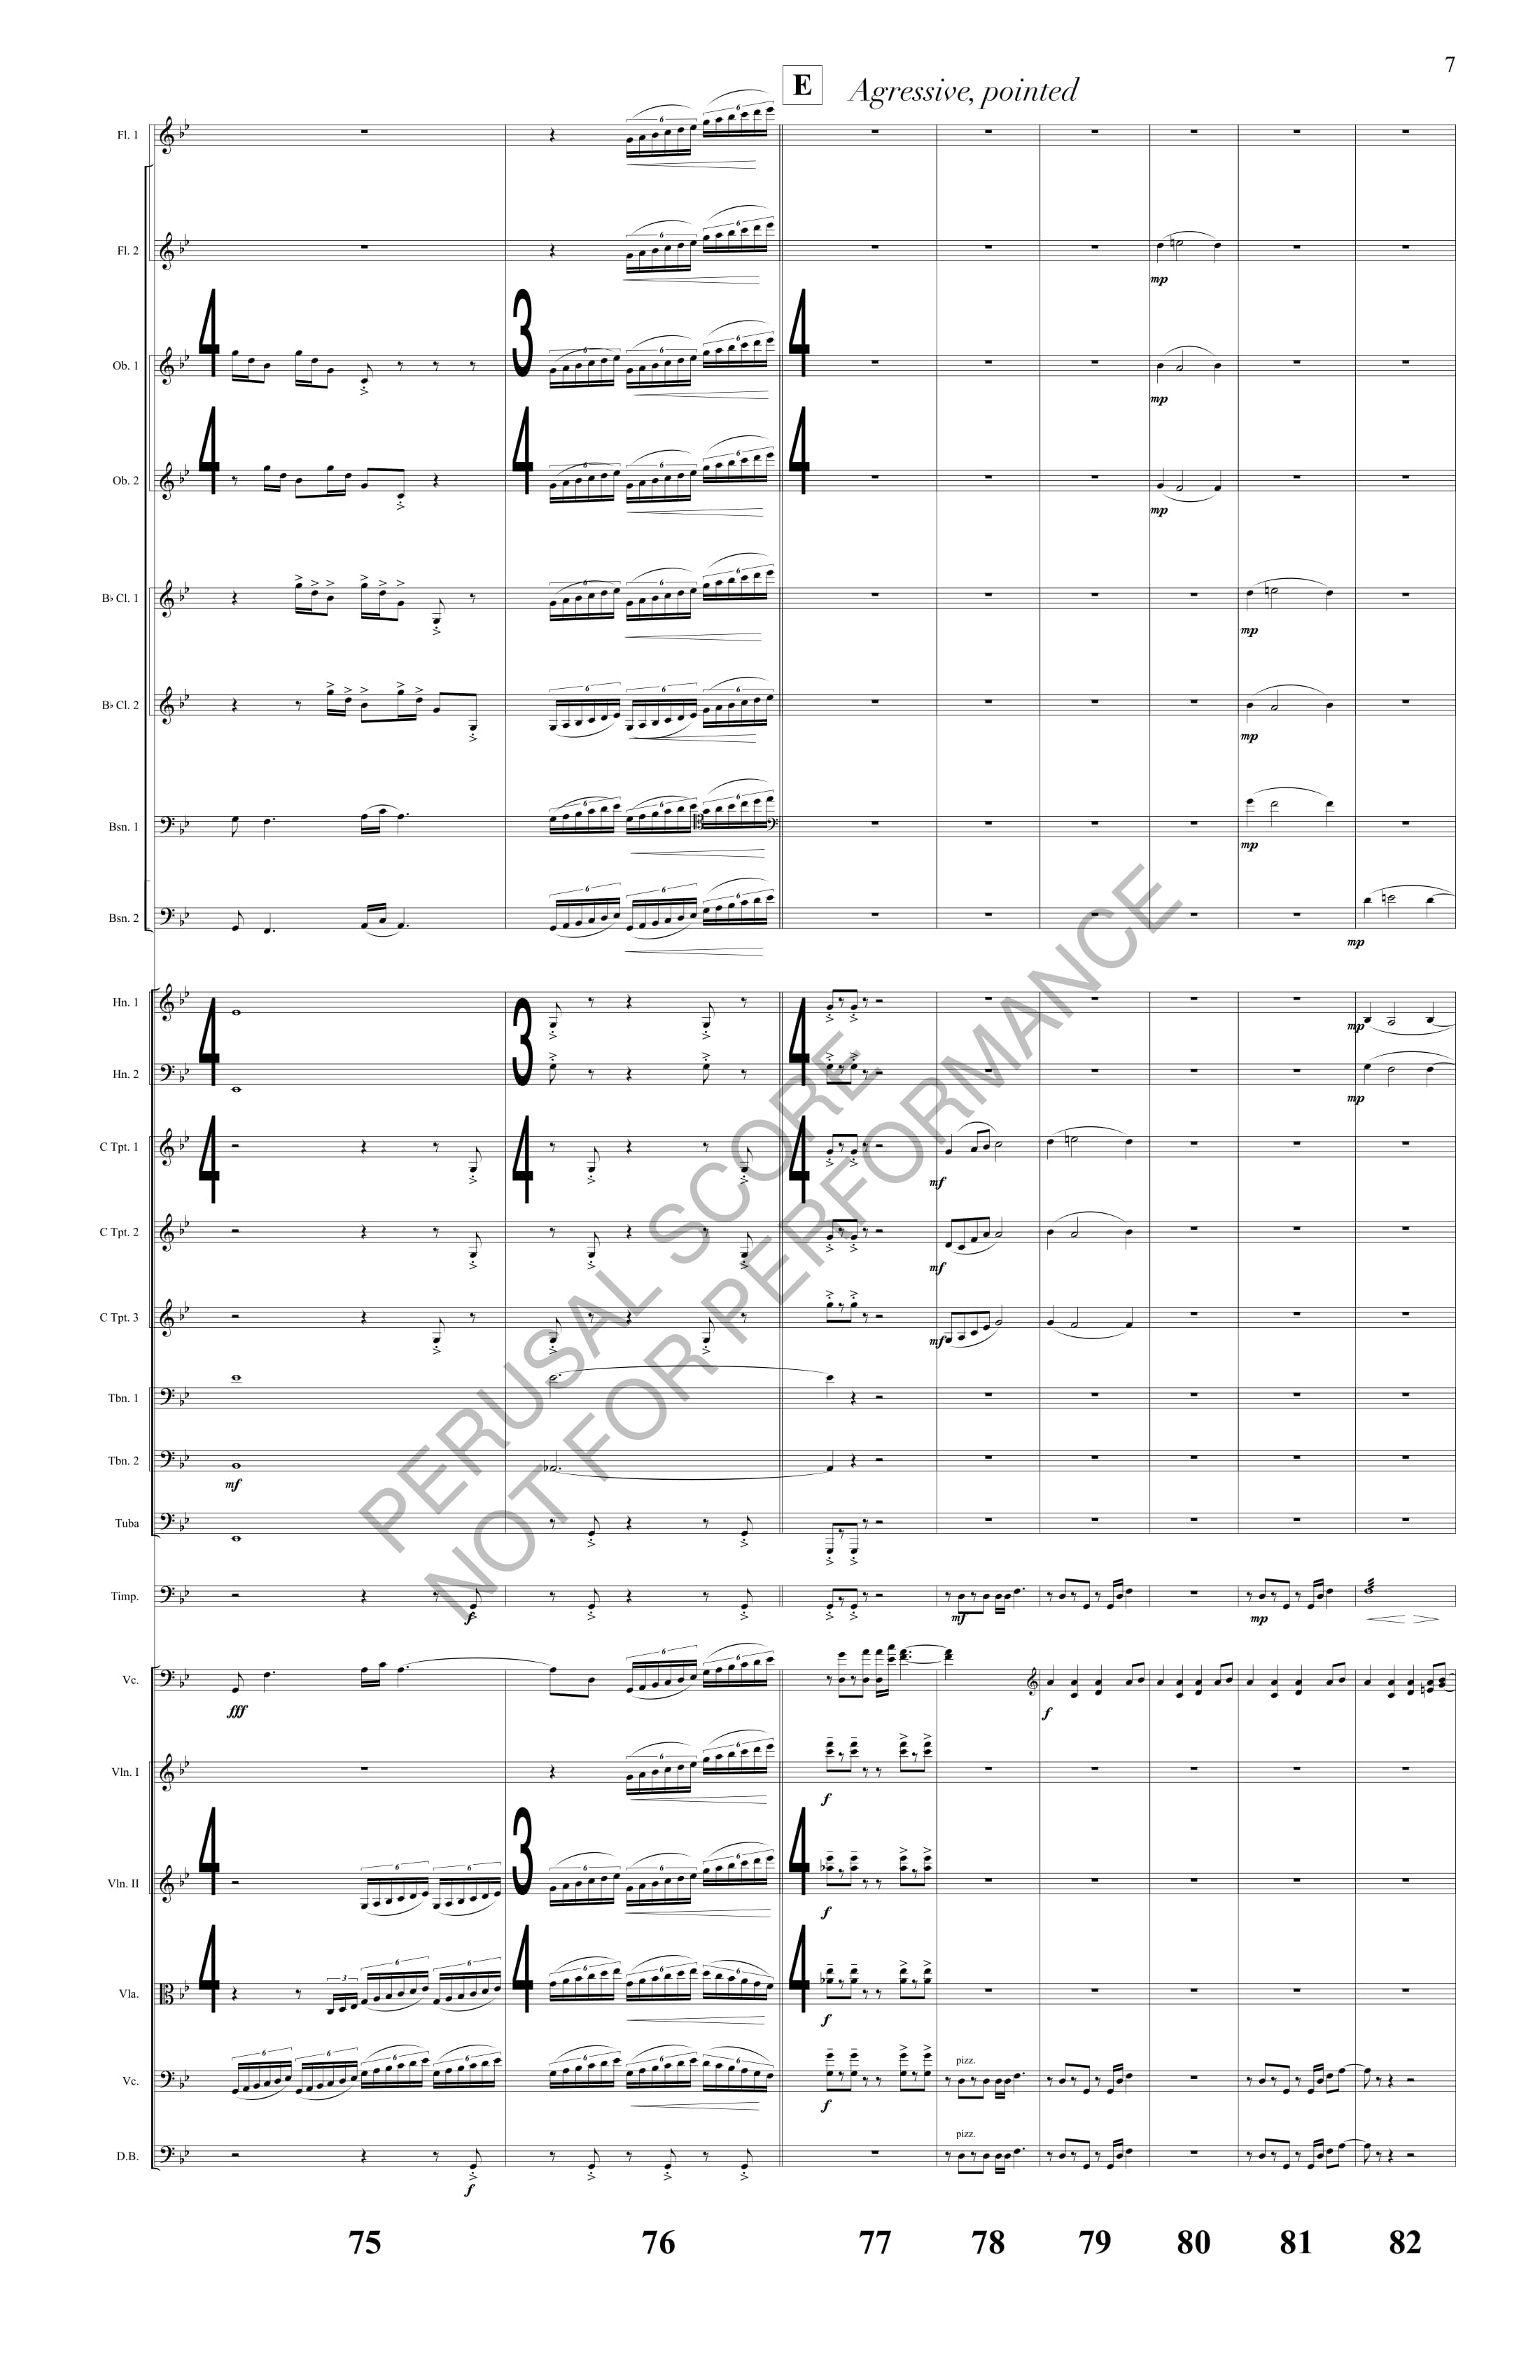 Boyd Tekton Score-watermark-13.jpg